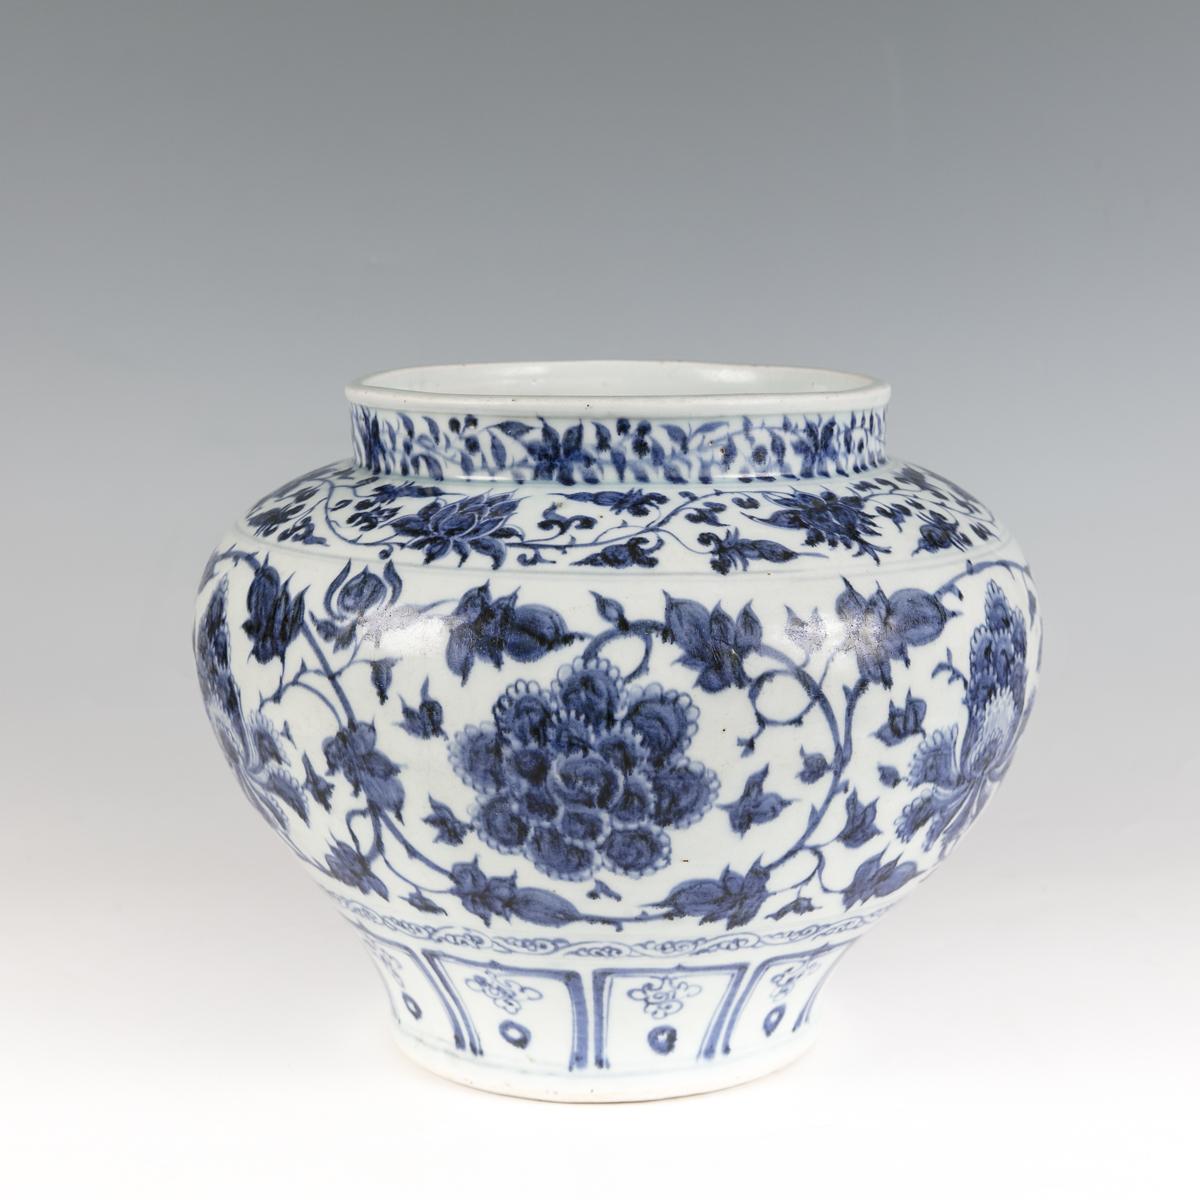 ASIAN ART - Fine Oriental Ceramics, Sculpture & Art